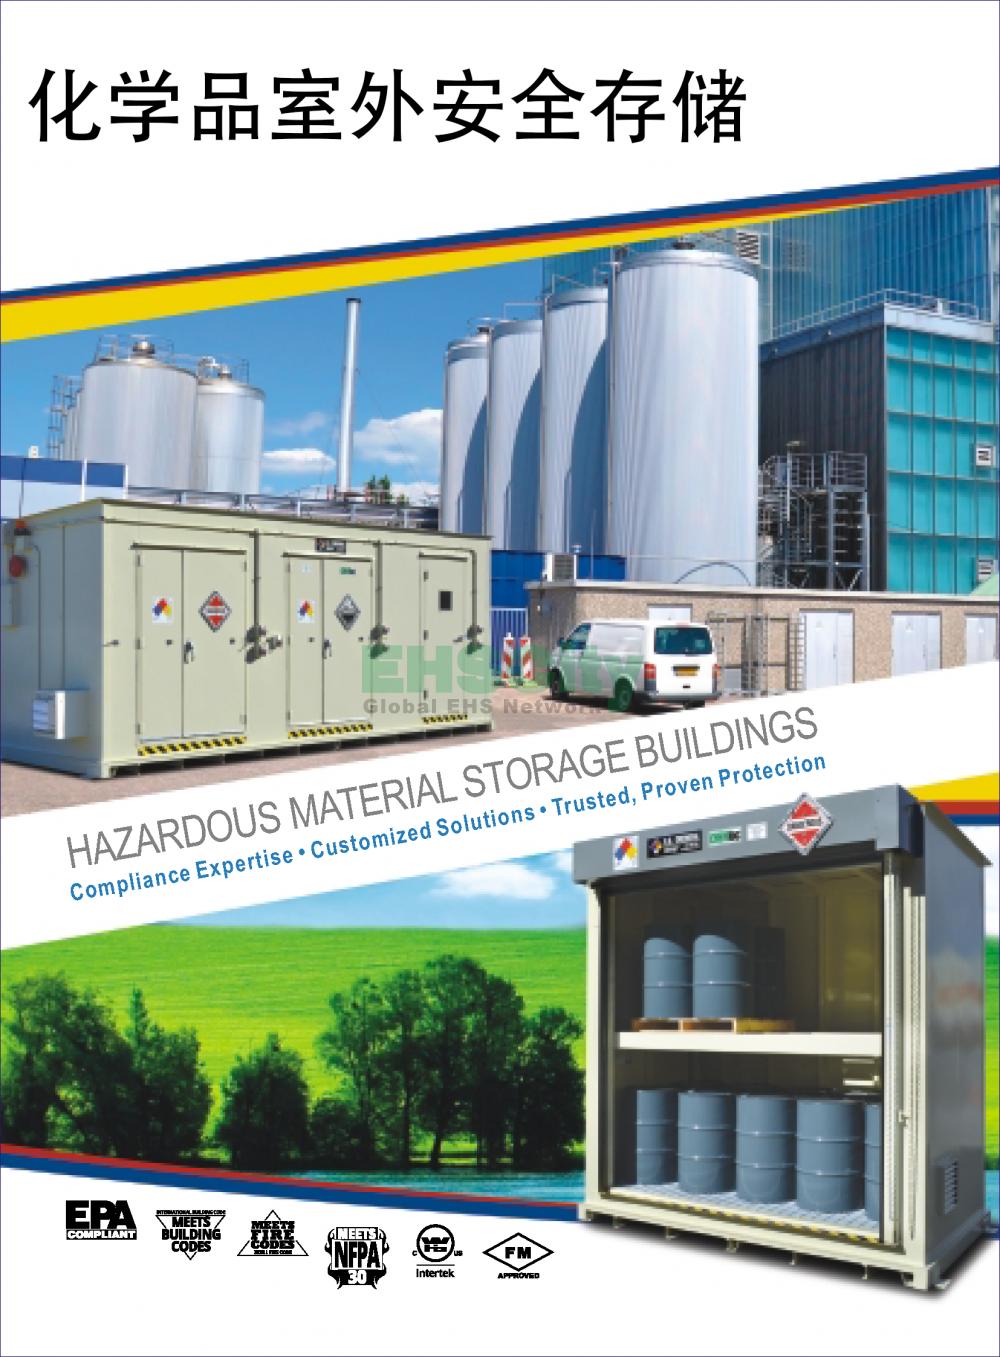 室外化学品安全存储 EHSCity认证 chemical storage buildings